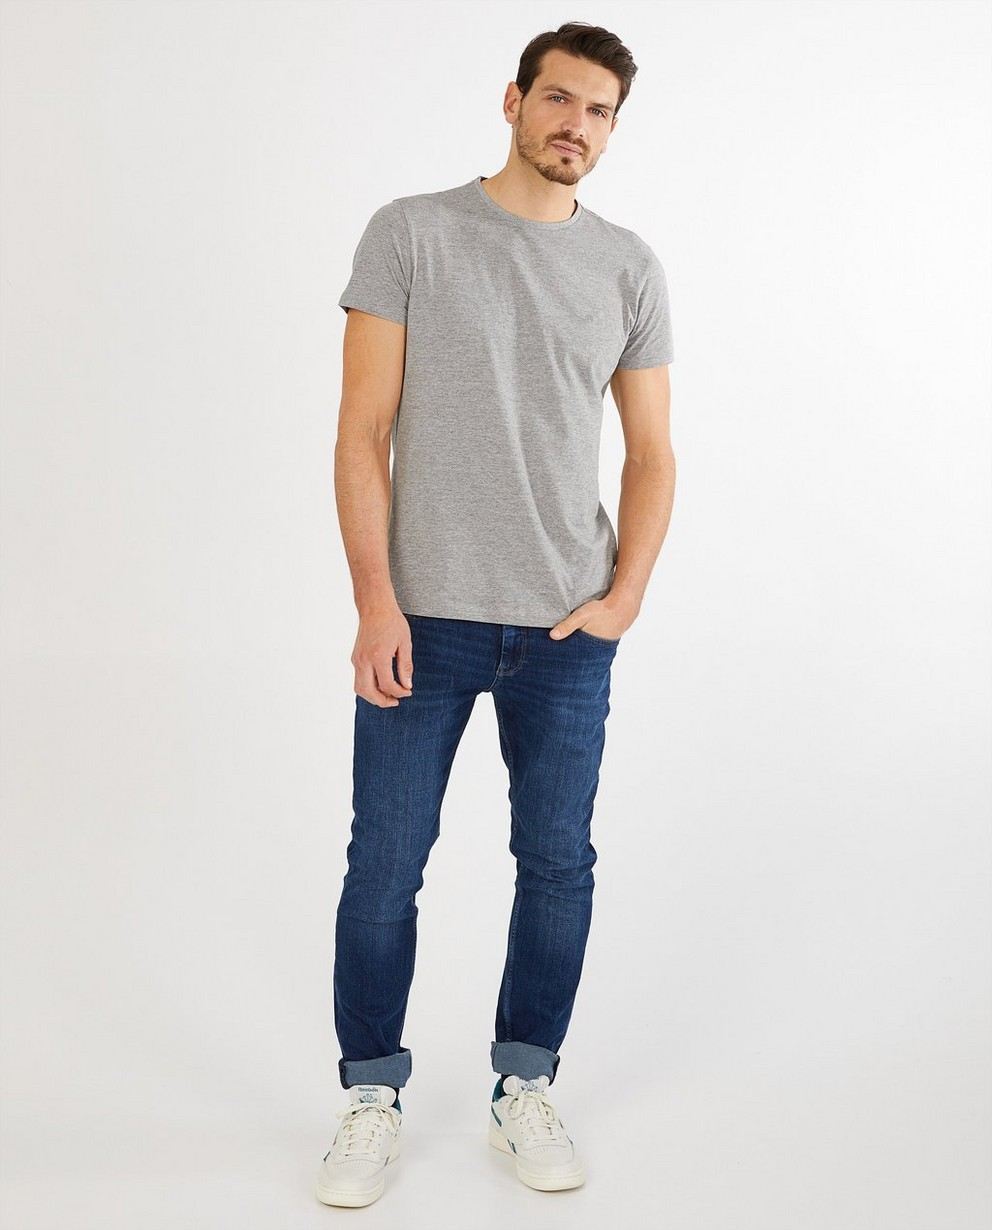 T-shirt bleu foncé en coton bio - col rond - JBC